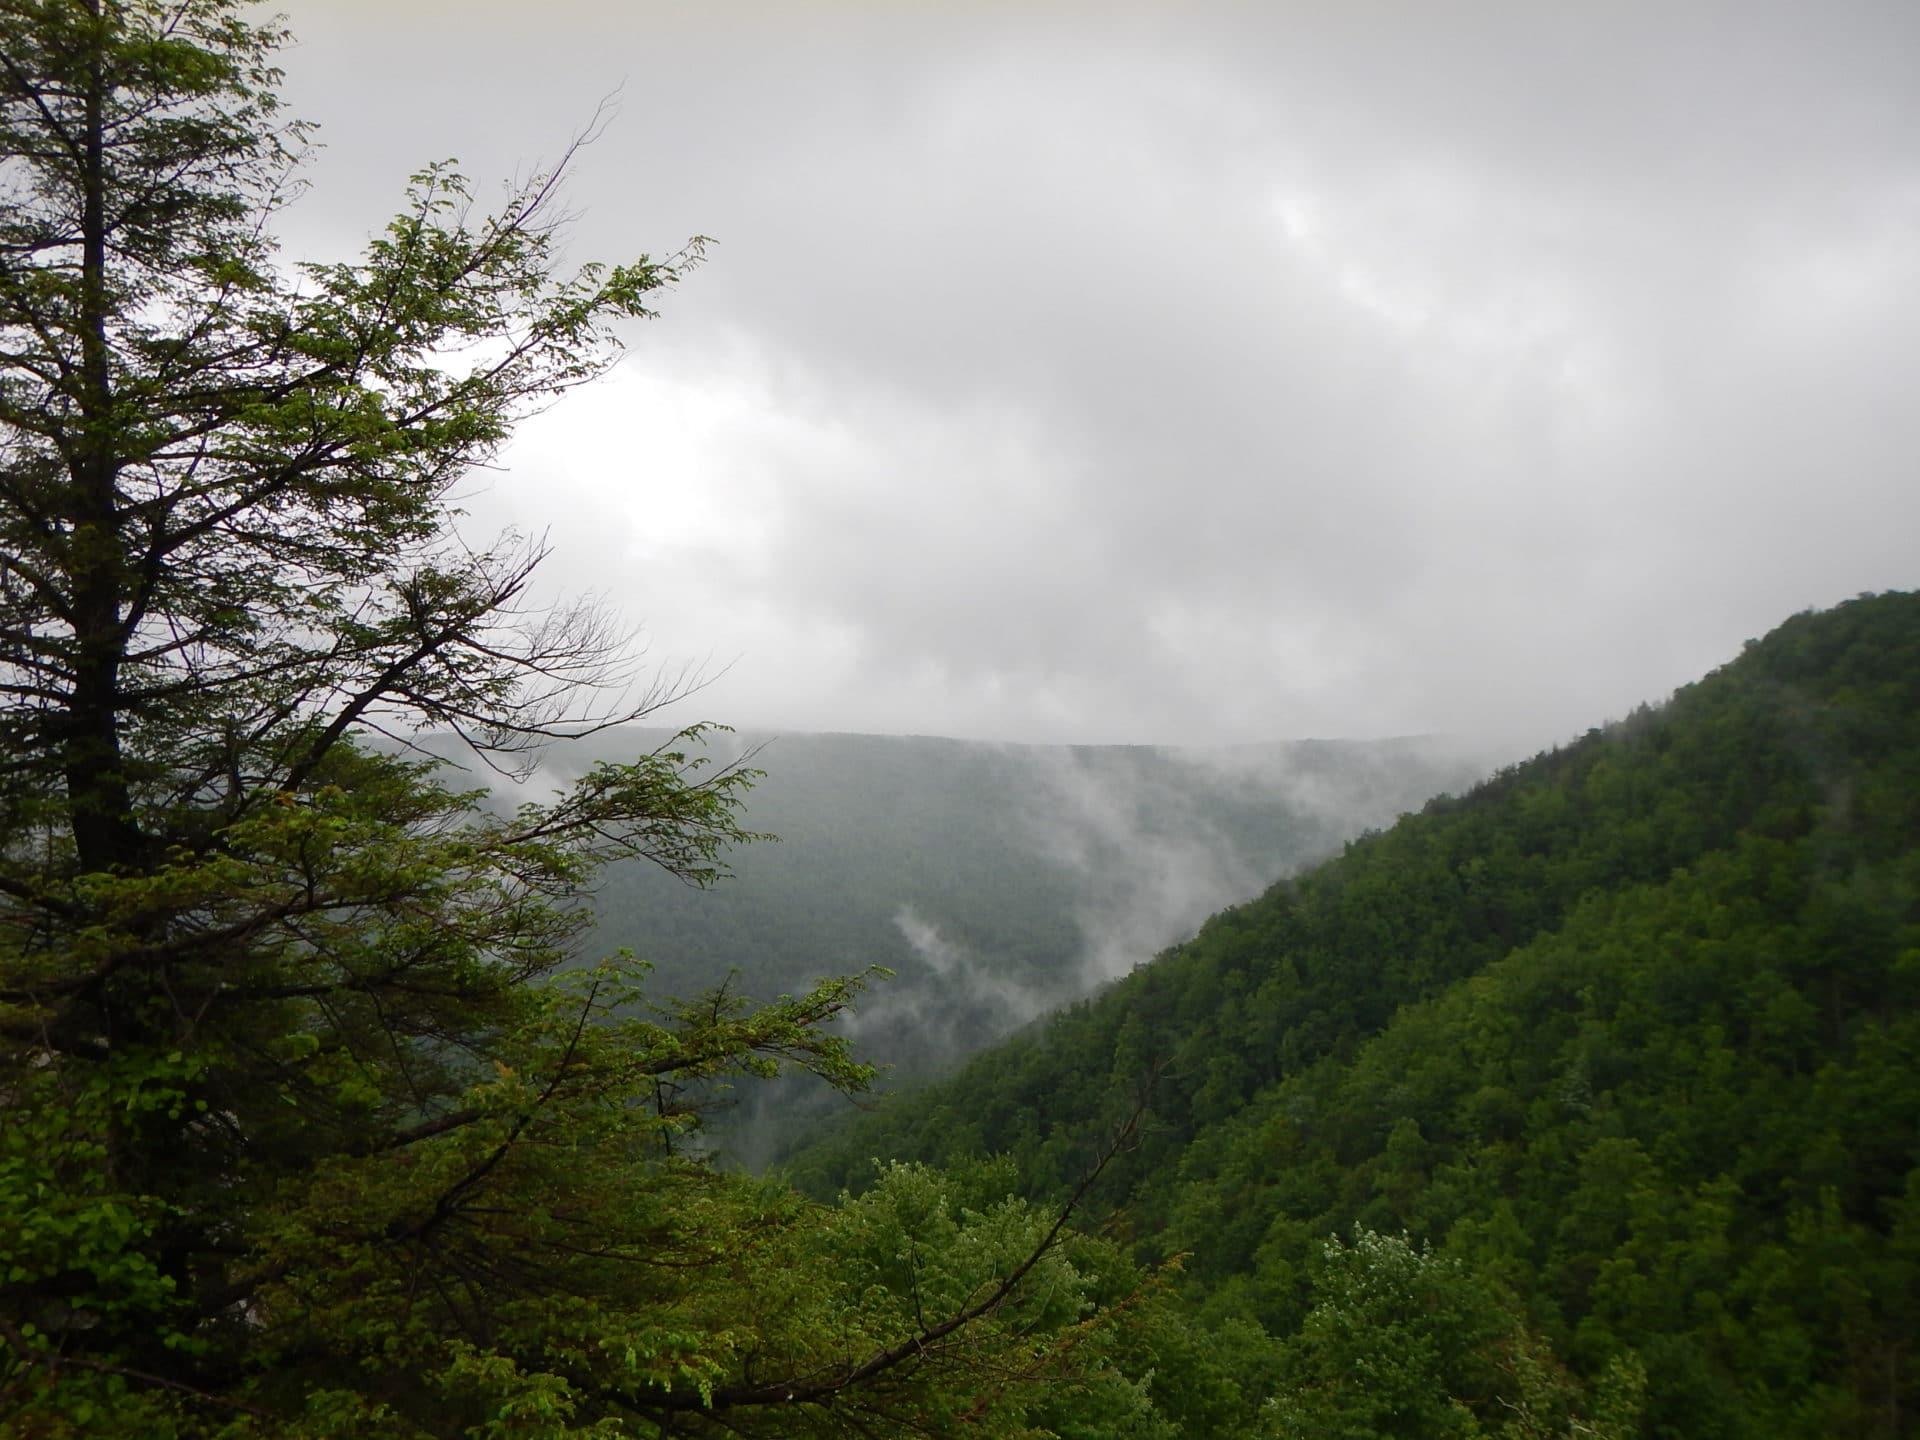 view from Big Run overlook